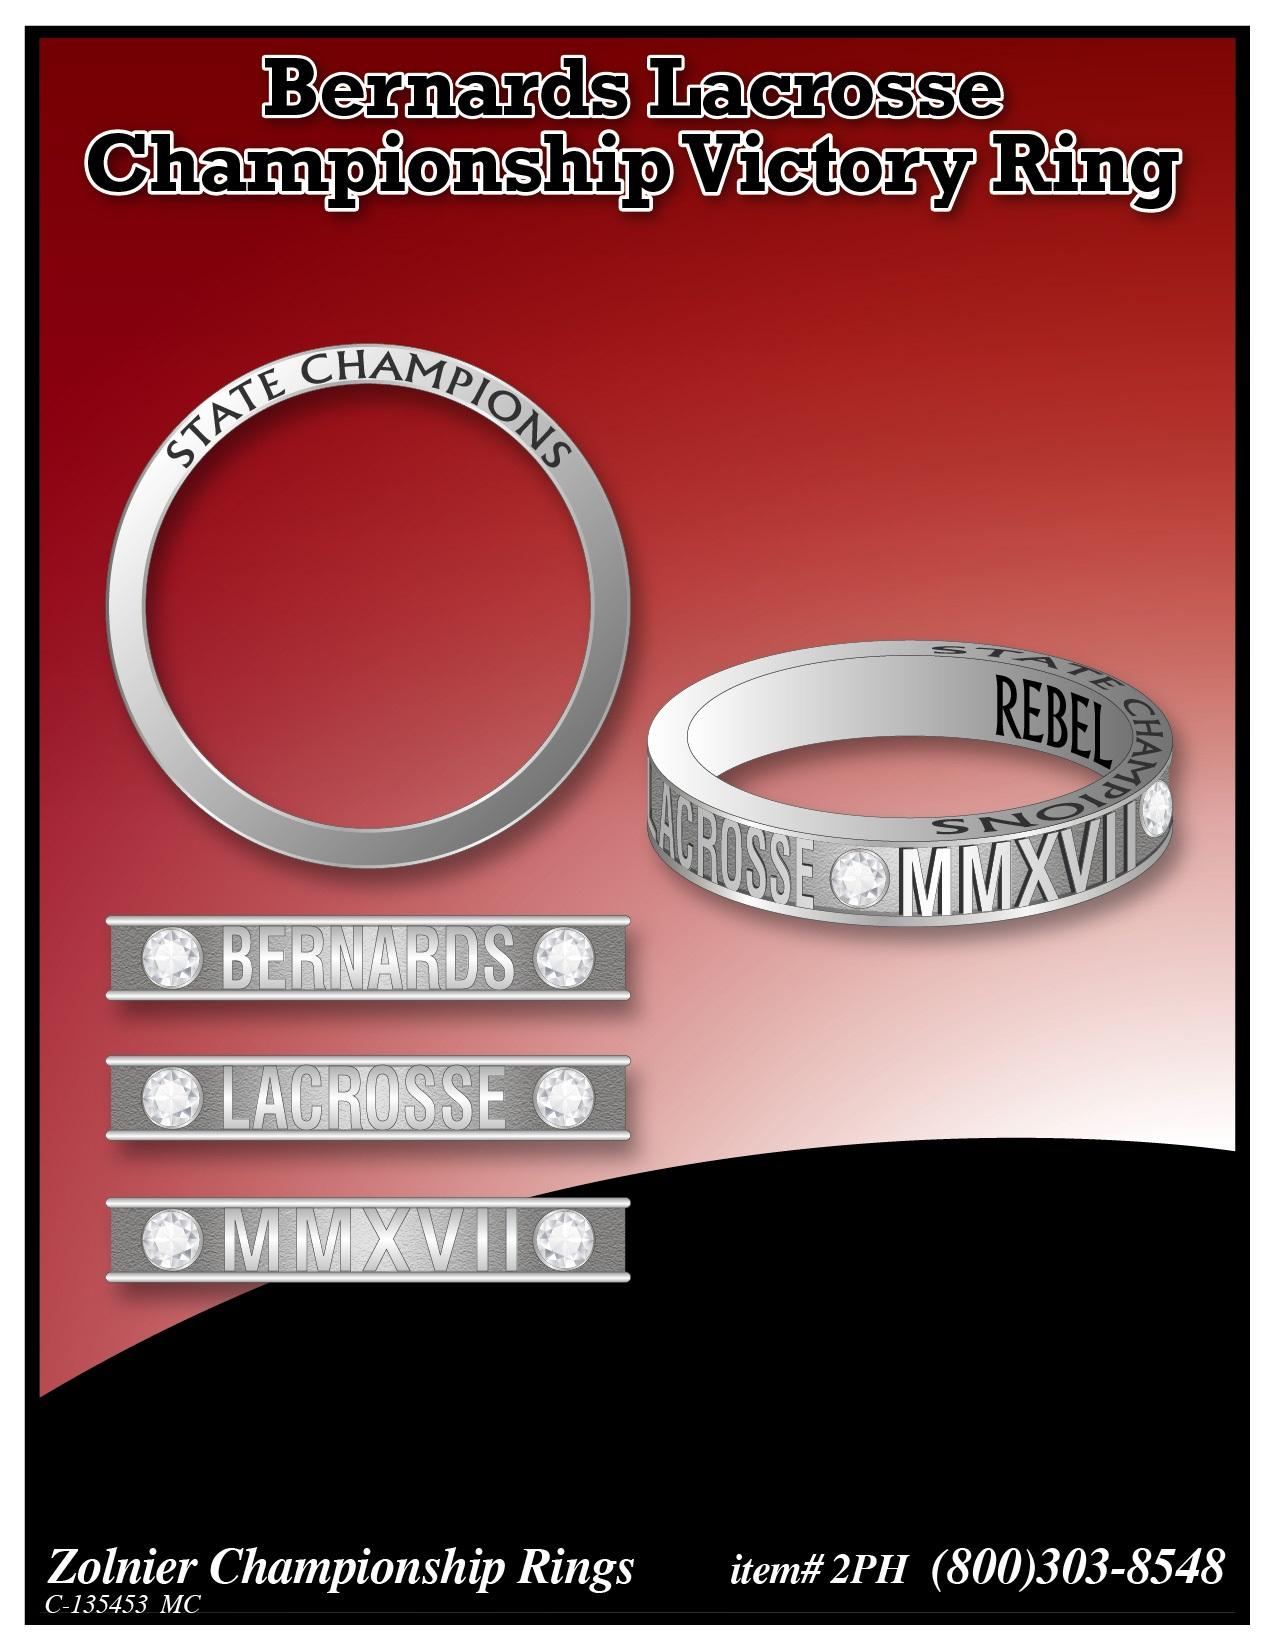 C-135453 Bernards Lacrosse Champ Ring STEEL